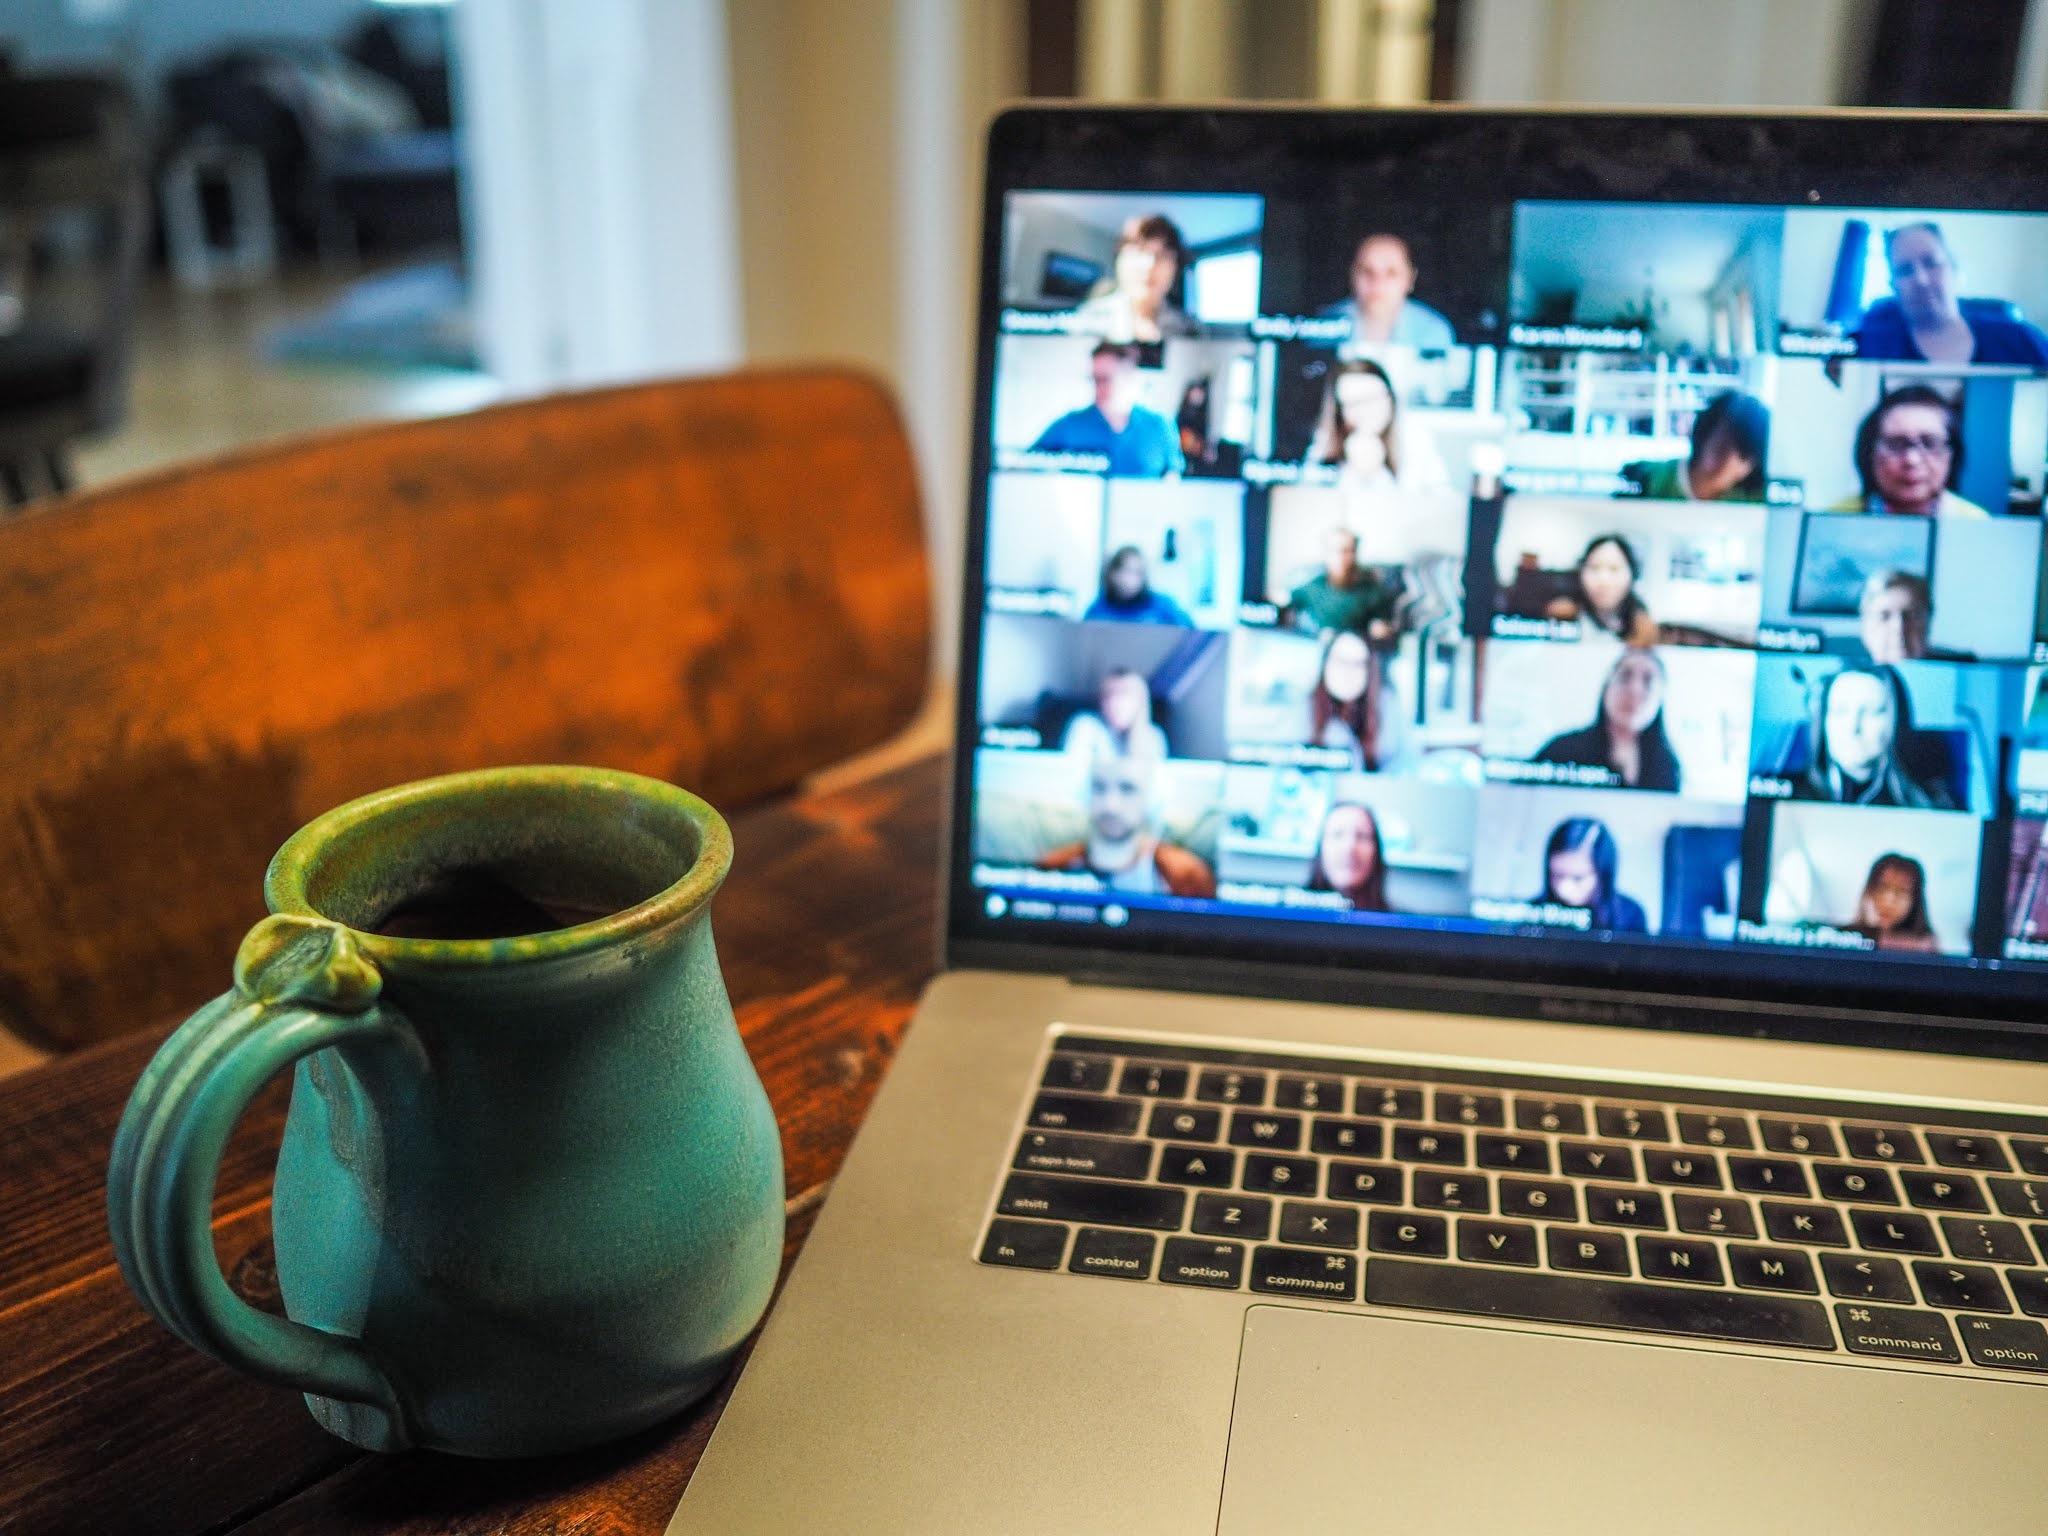 zoom quiz facetime on laptop by mug of tea